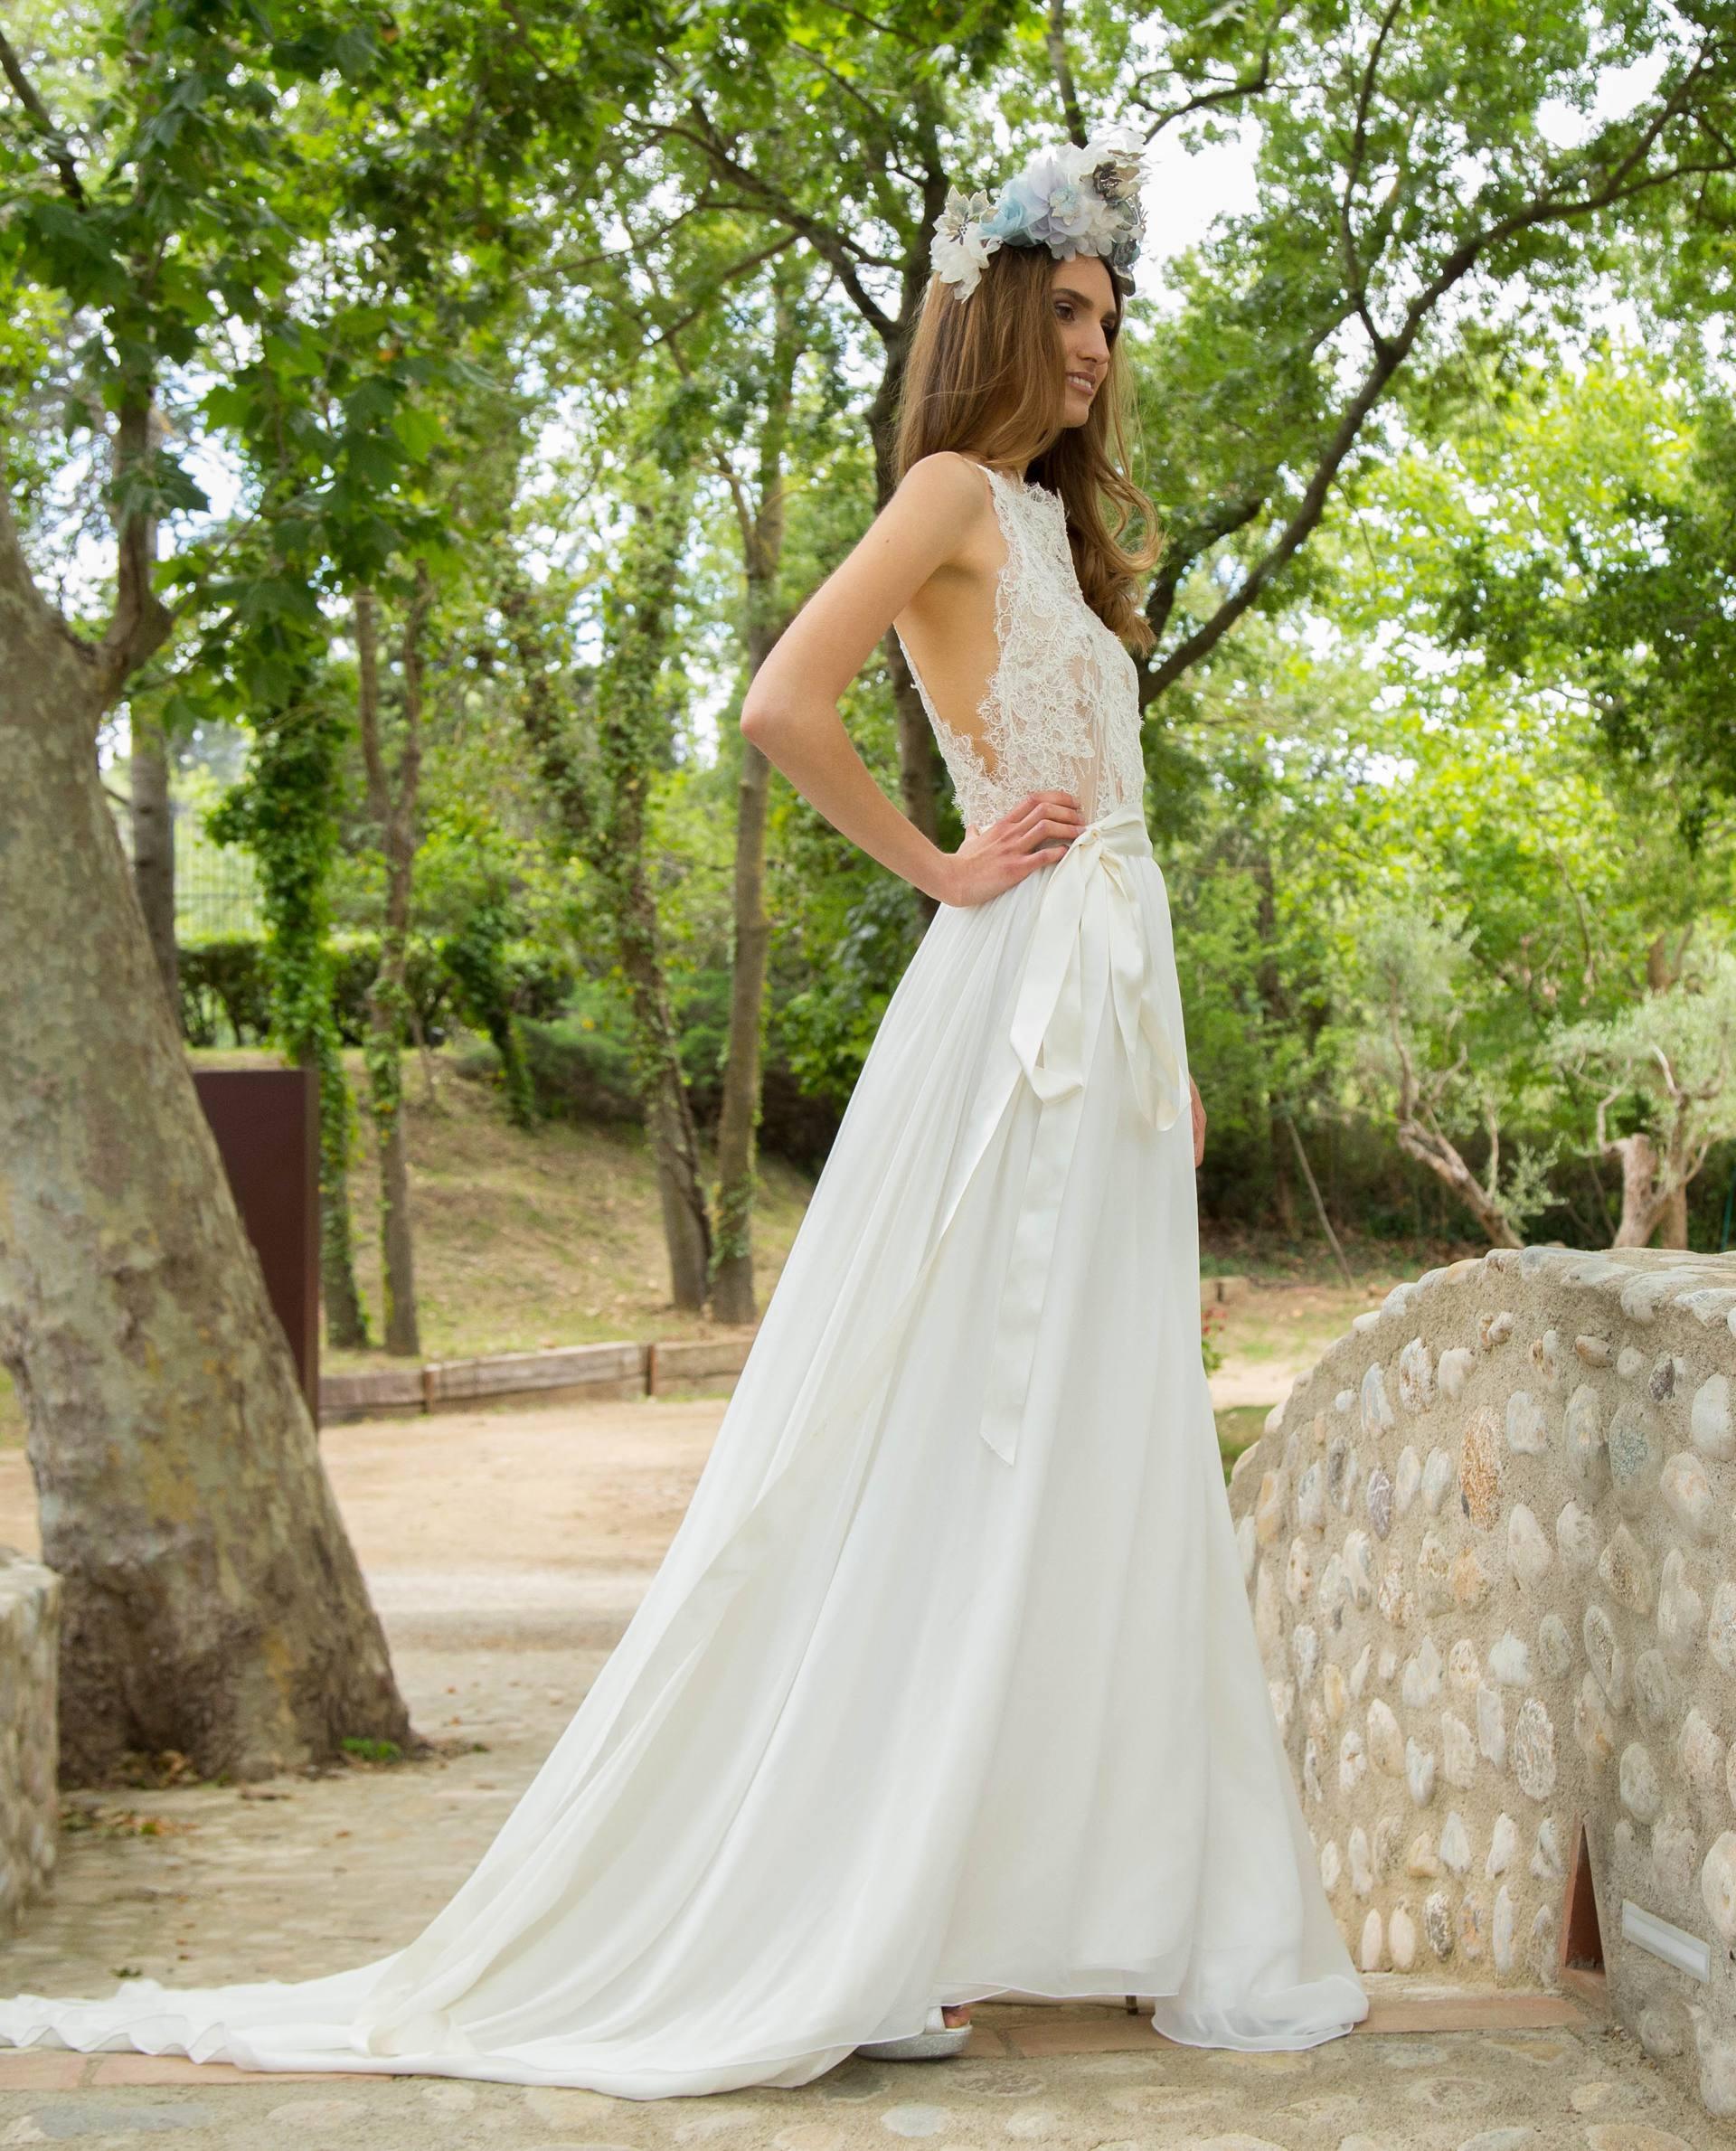 BRIDAL-NATURE 2018/19 - VESTIDOS - vestido novia Elda